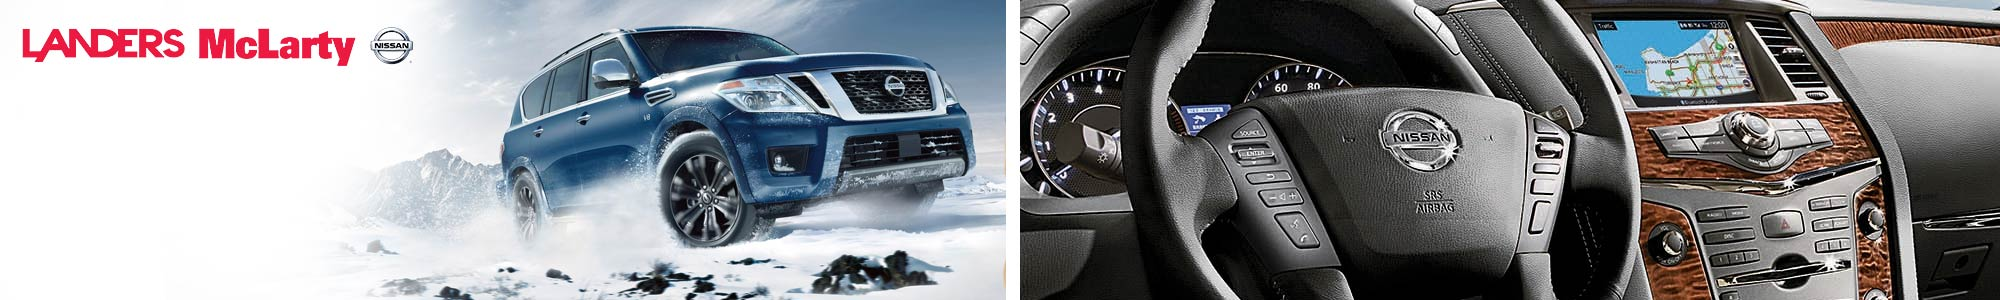 2020 Nissan Armada Interior and Exterior